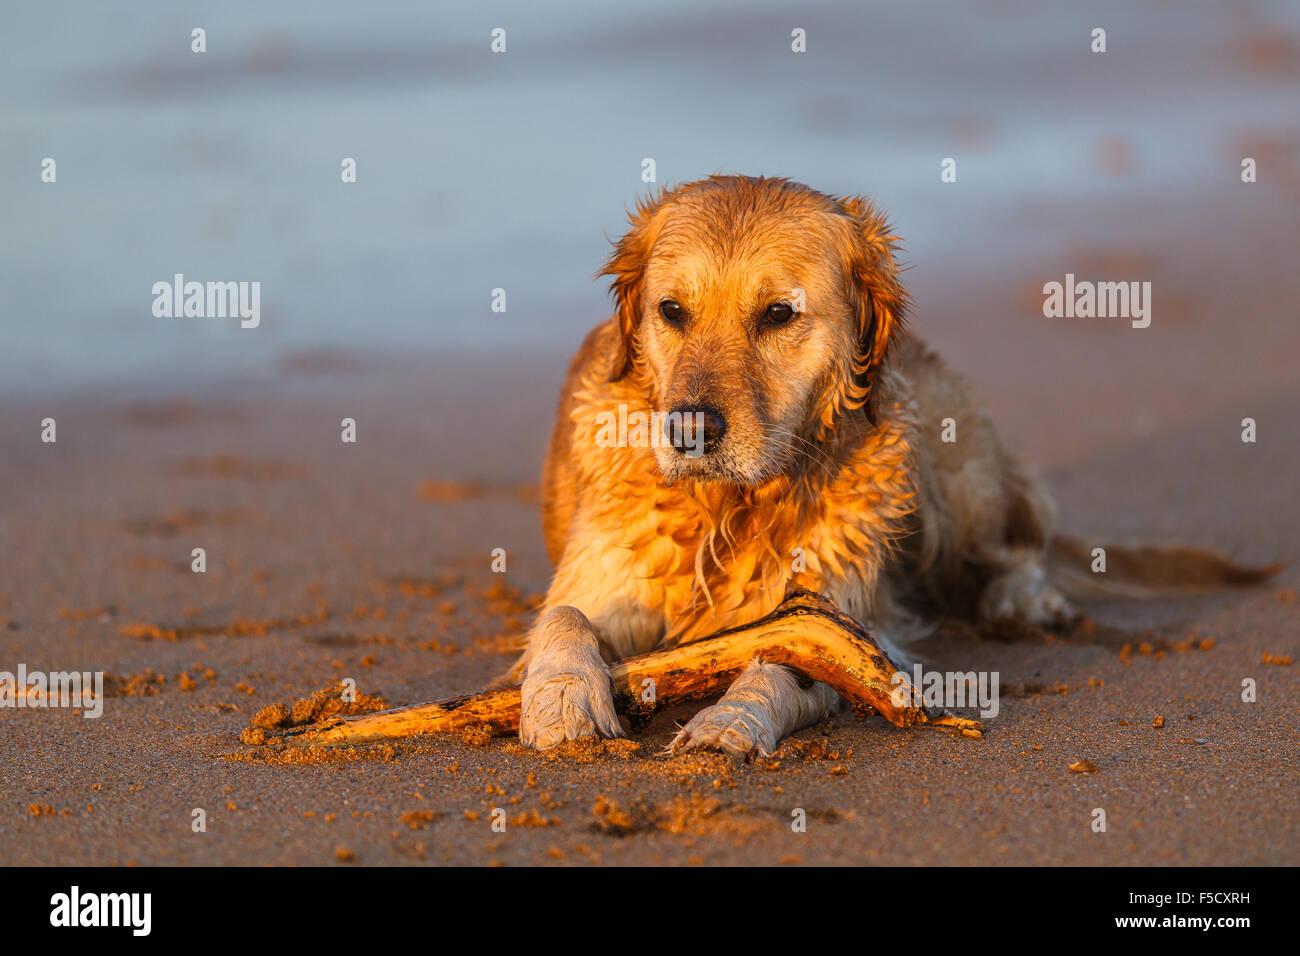 A Golden Retriever Puppy Relaxing At The Beach By Sunset Valdearenas Stock Photo Alamy